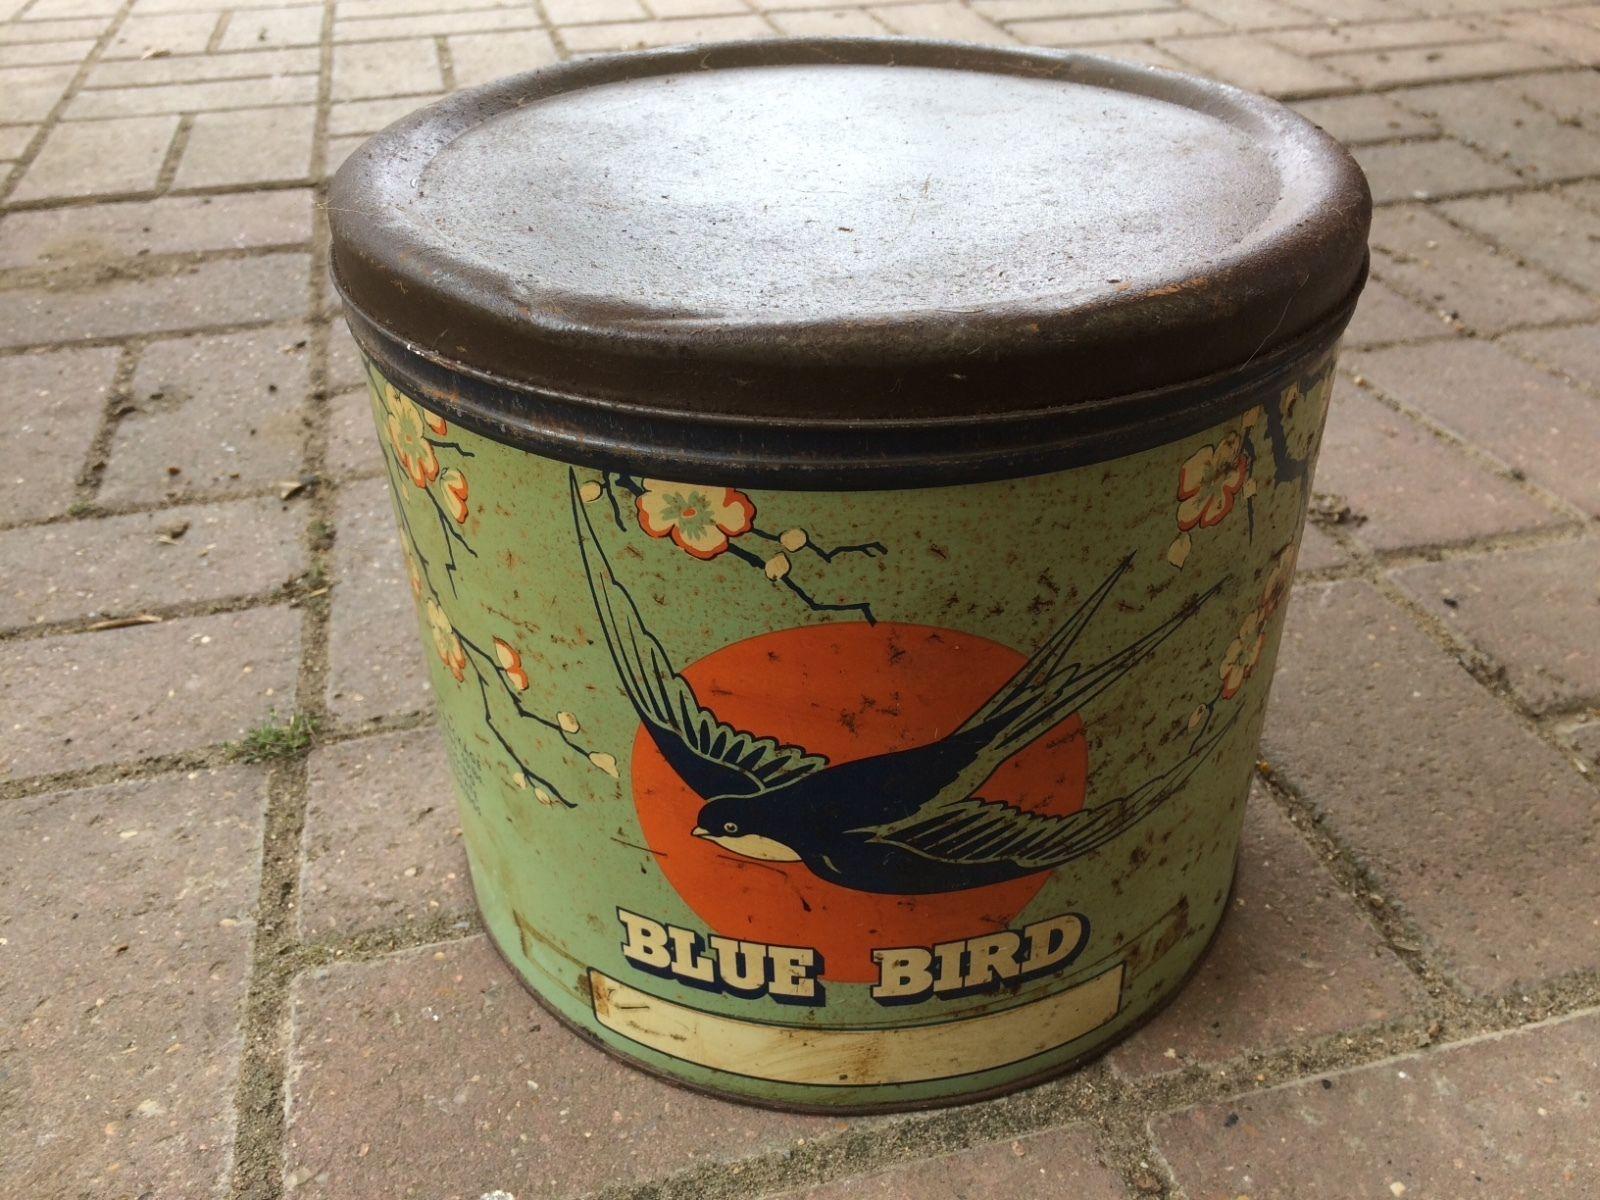 USED VINTAGE BLUEBIRD SWEET TOFFEE TIN SHOP DISPLAY | eBay